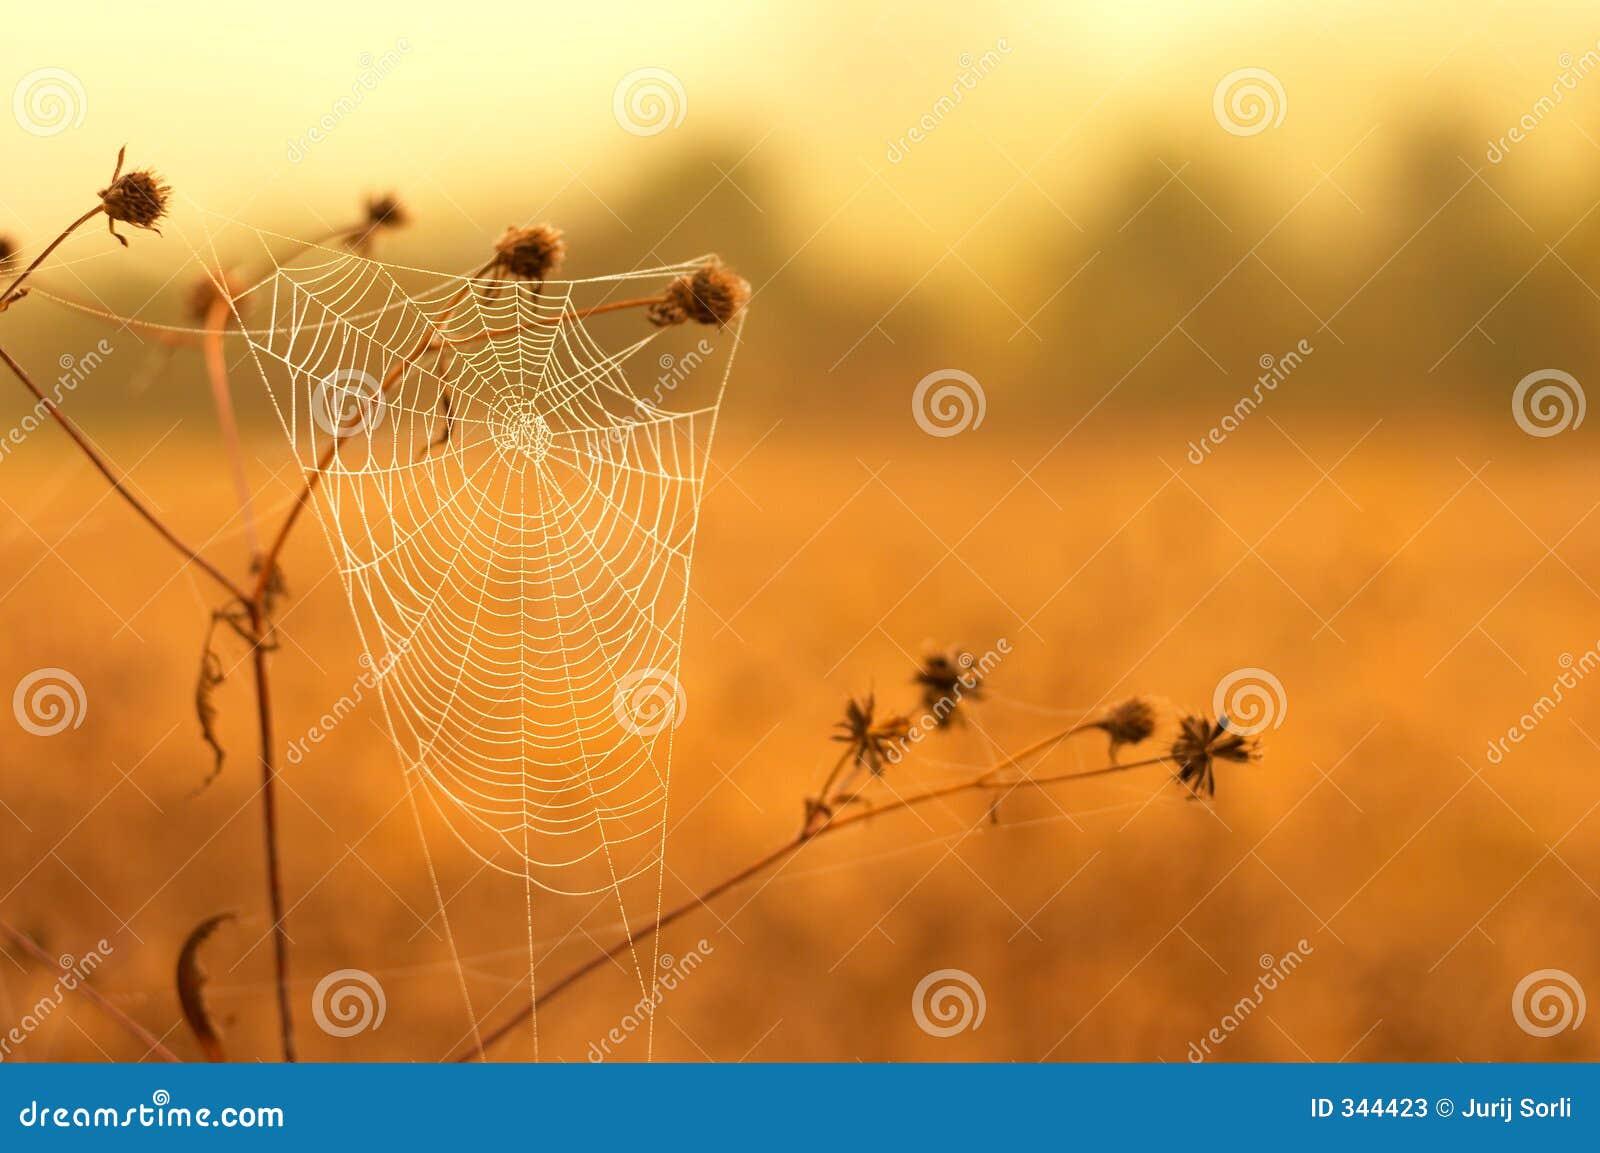 Wit spinneweb